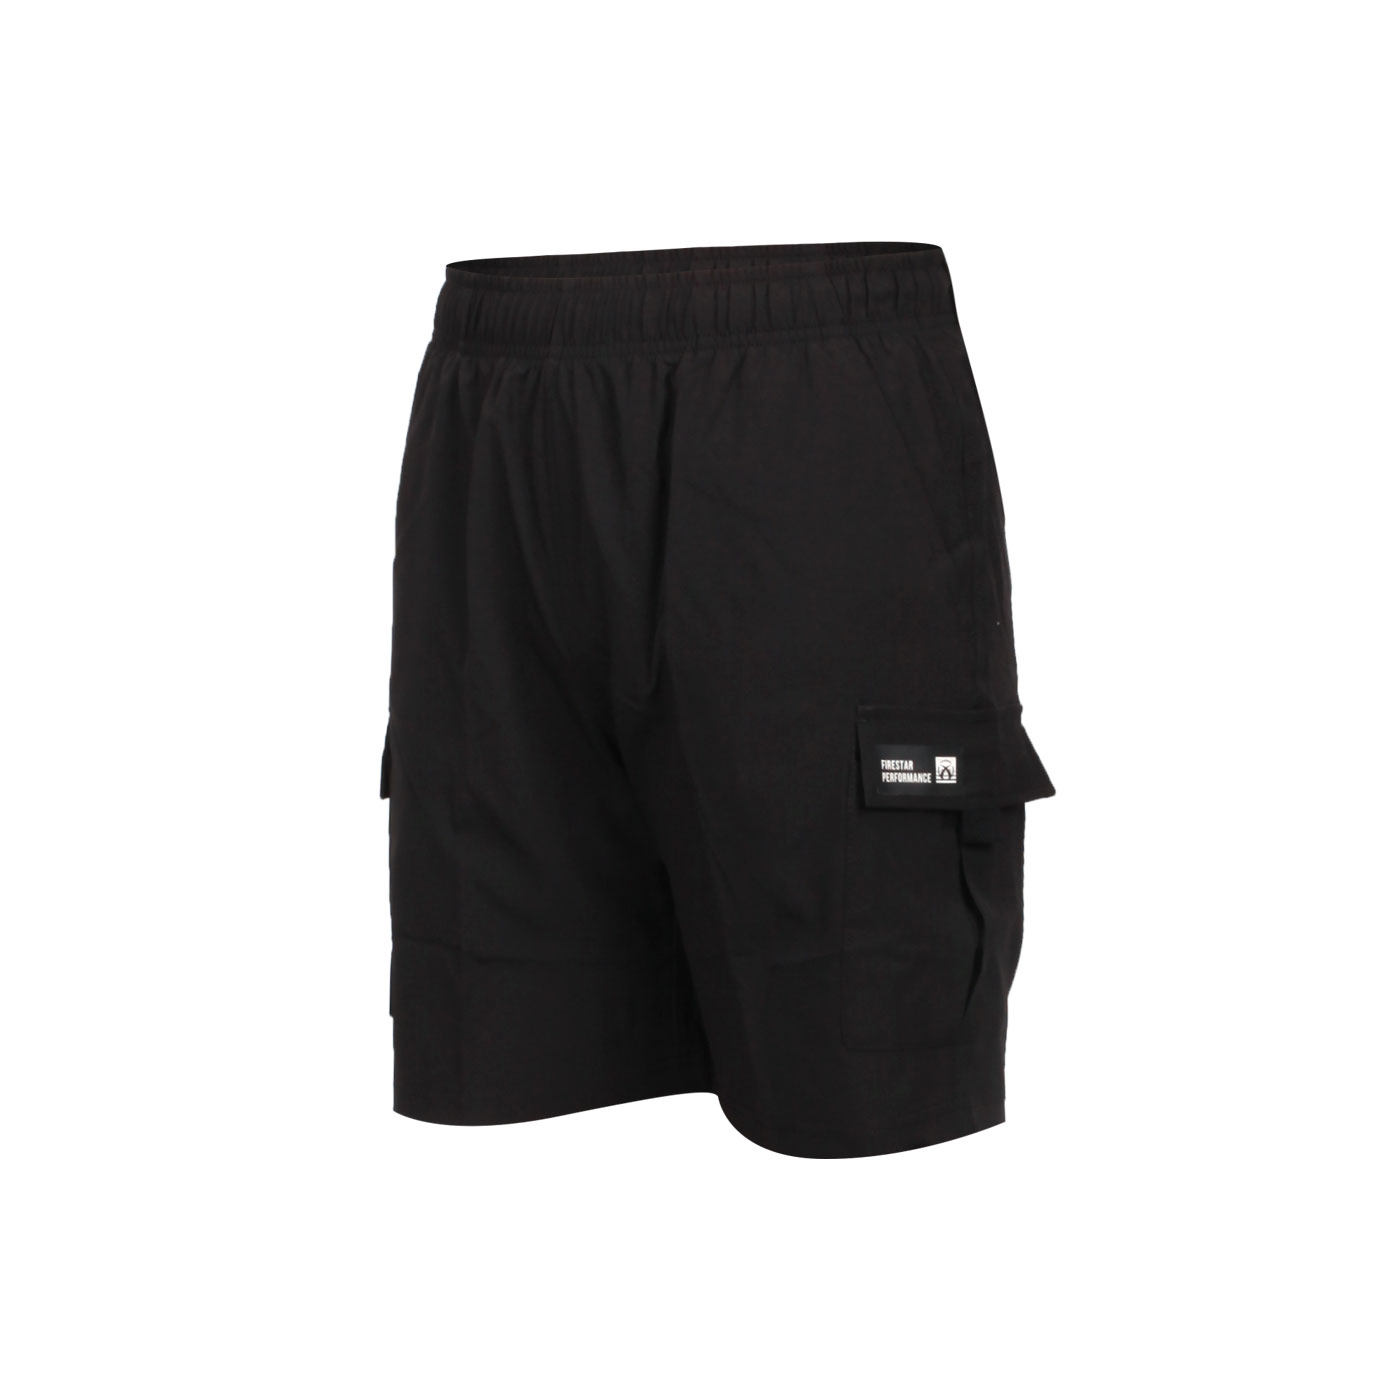 FIRESTAR 女款彈性多口袋短褲 CL027-10